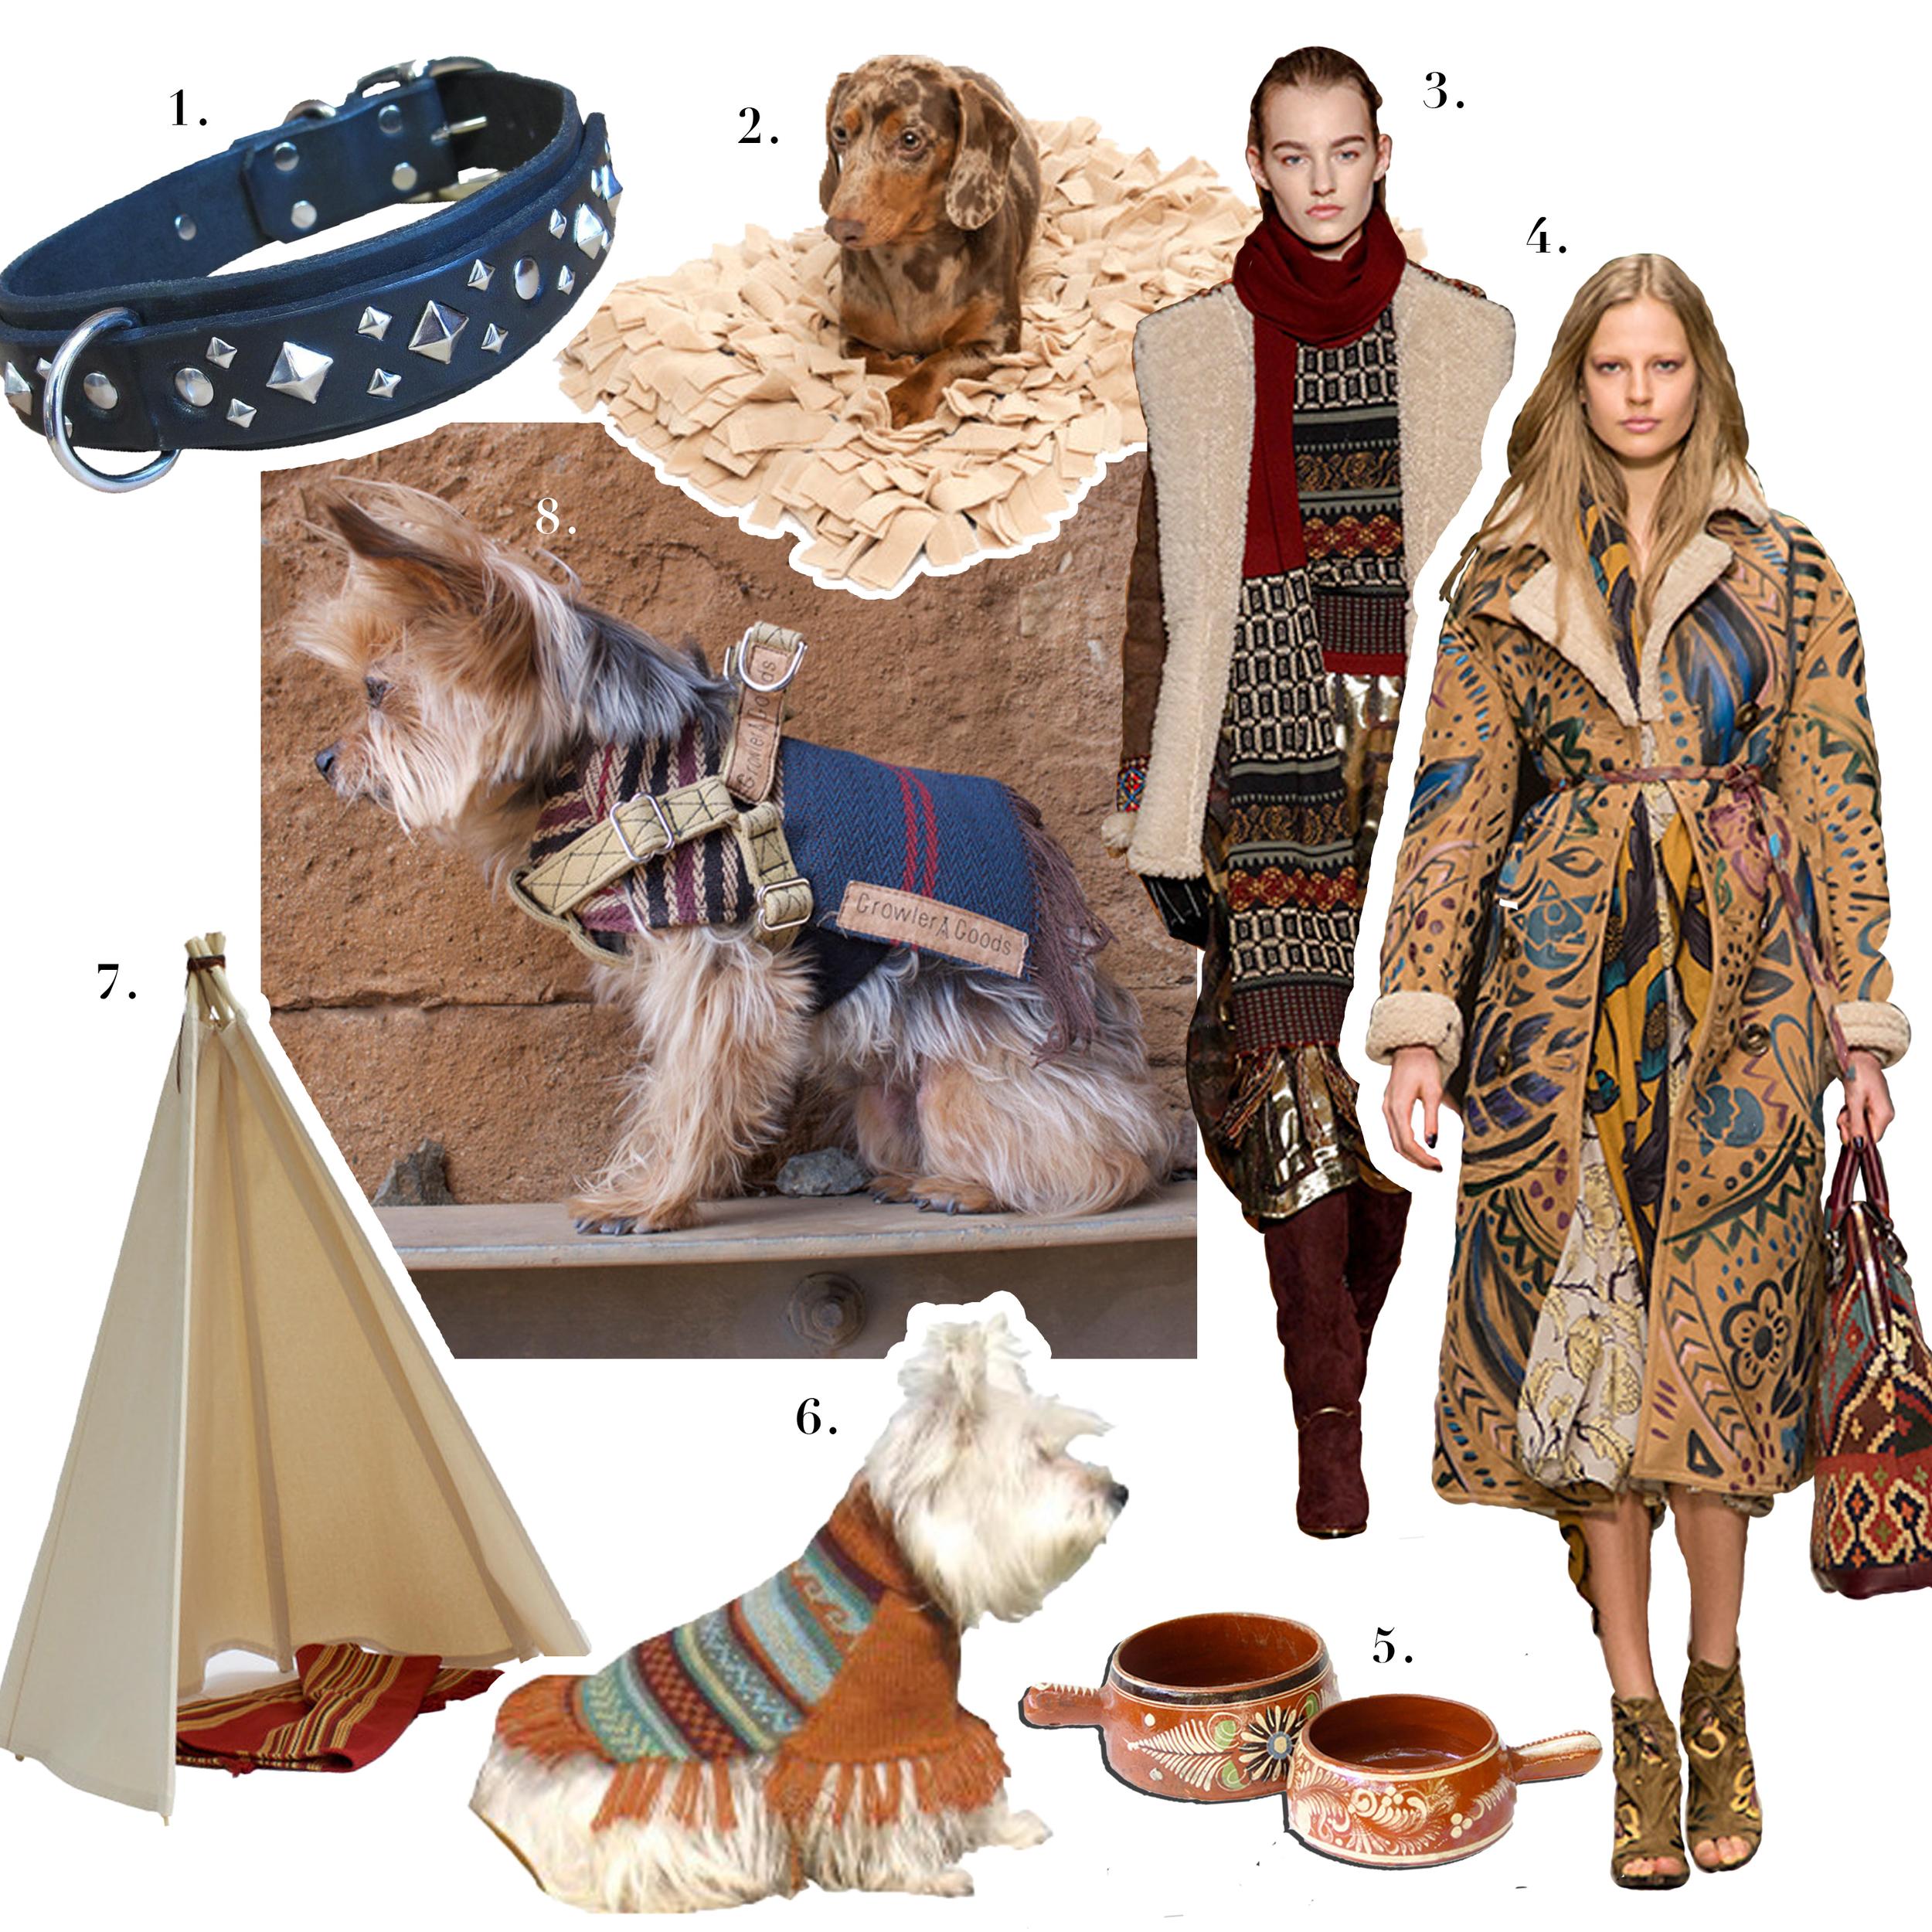 1. Paco Collars,   Berlin Deluxe Collar   2. Wildebeest,   Meadow Pet Rug in Milk Tea   3. Etro,   F/W 14-15   4. Burberry Prorsum,   F/W 14-15   5. Ike and Stella,   Painted Terracotta Dog Bowl Set   6. Alqo Wasi,   Winter Magic Sweater   7. Growler Goods,   Sanguaro Pet Tipi   8. Growler Goods,   Orpine Pet Harness